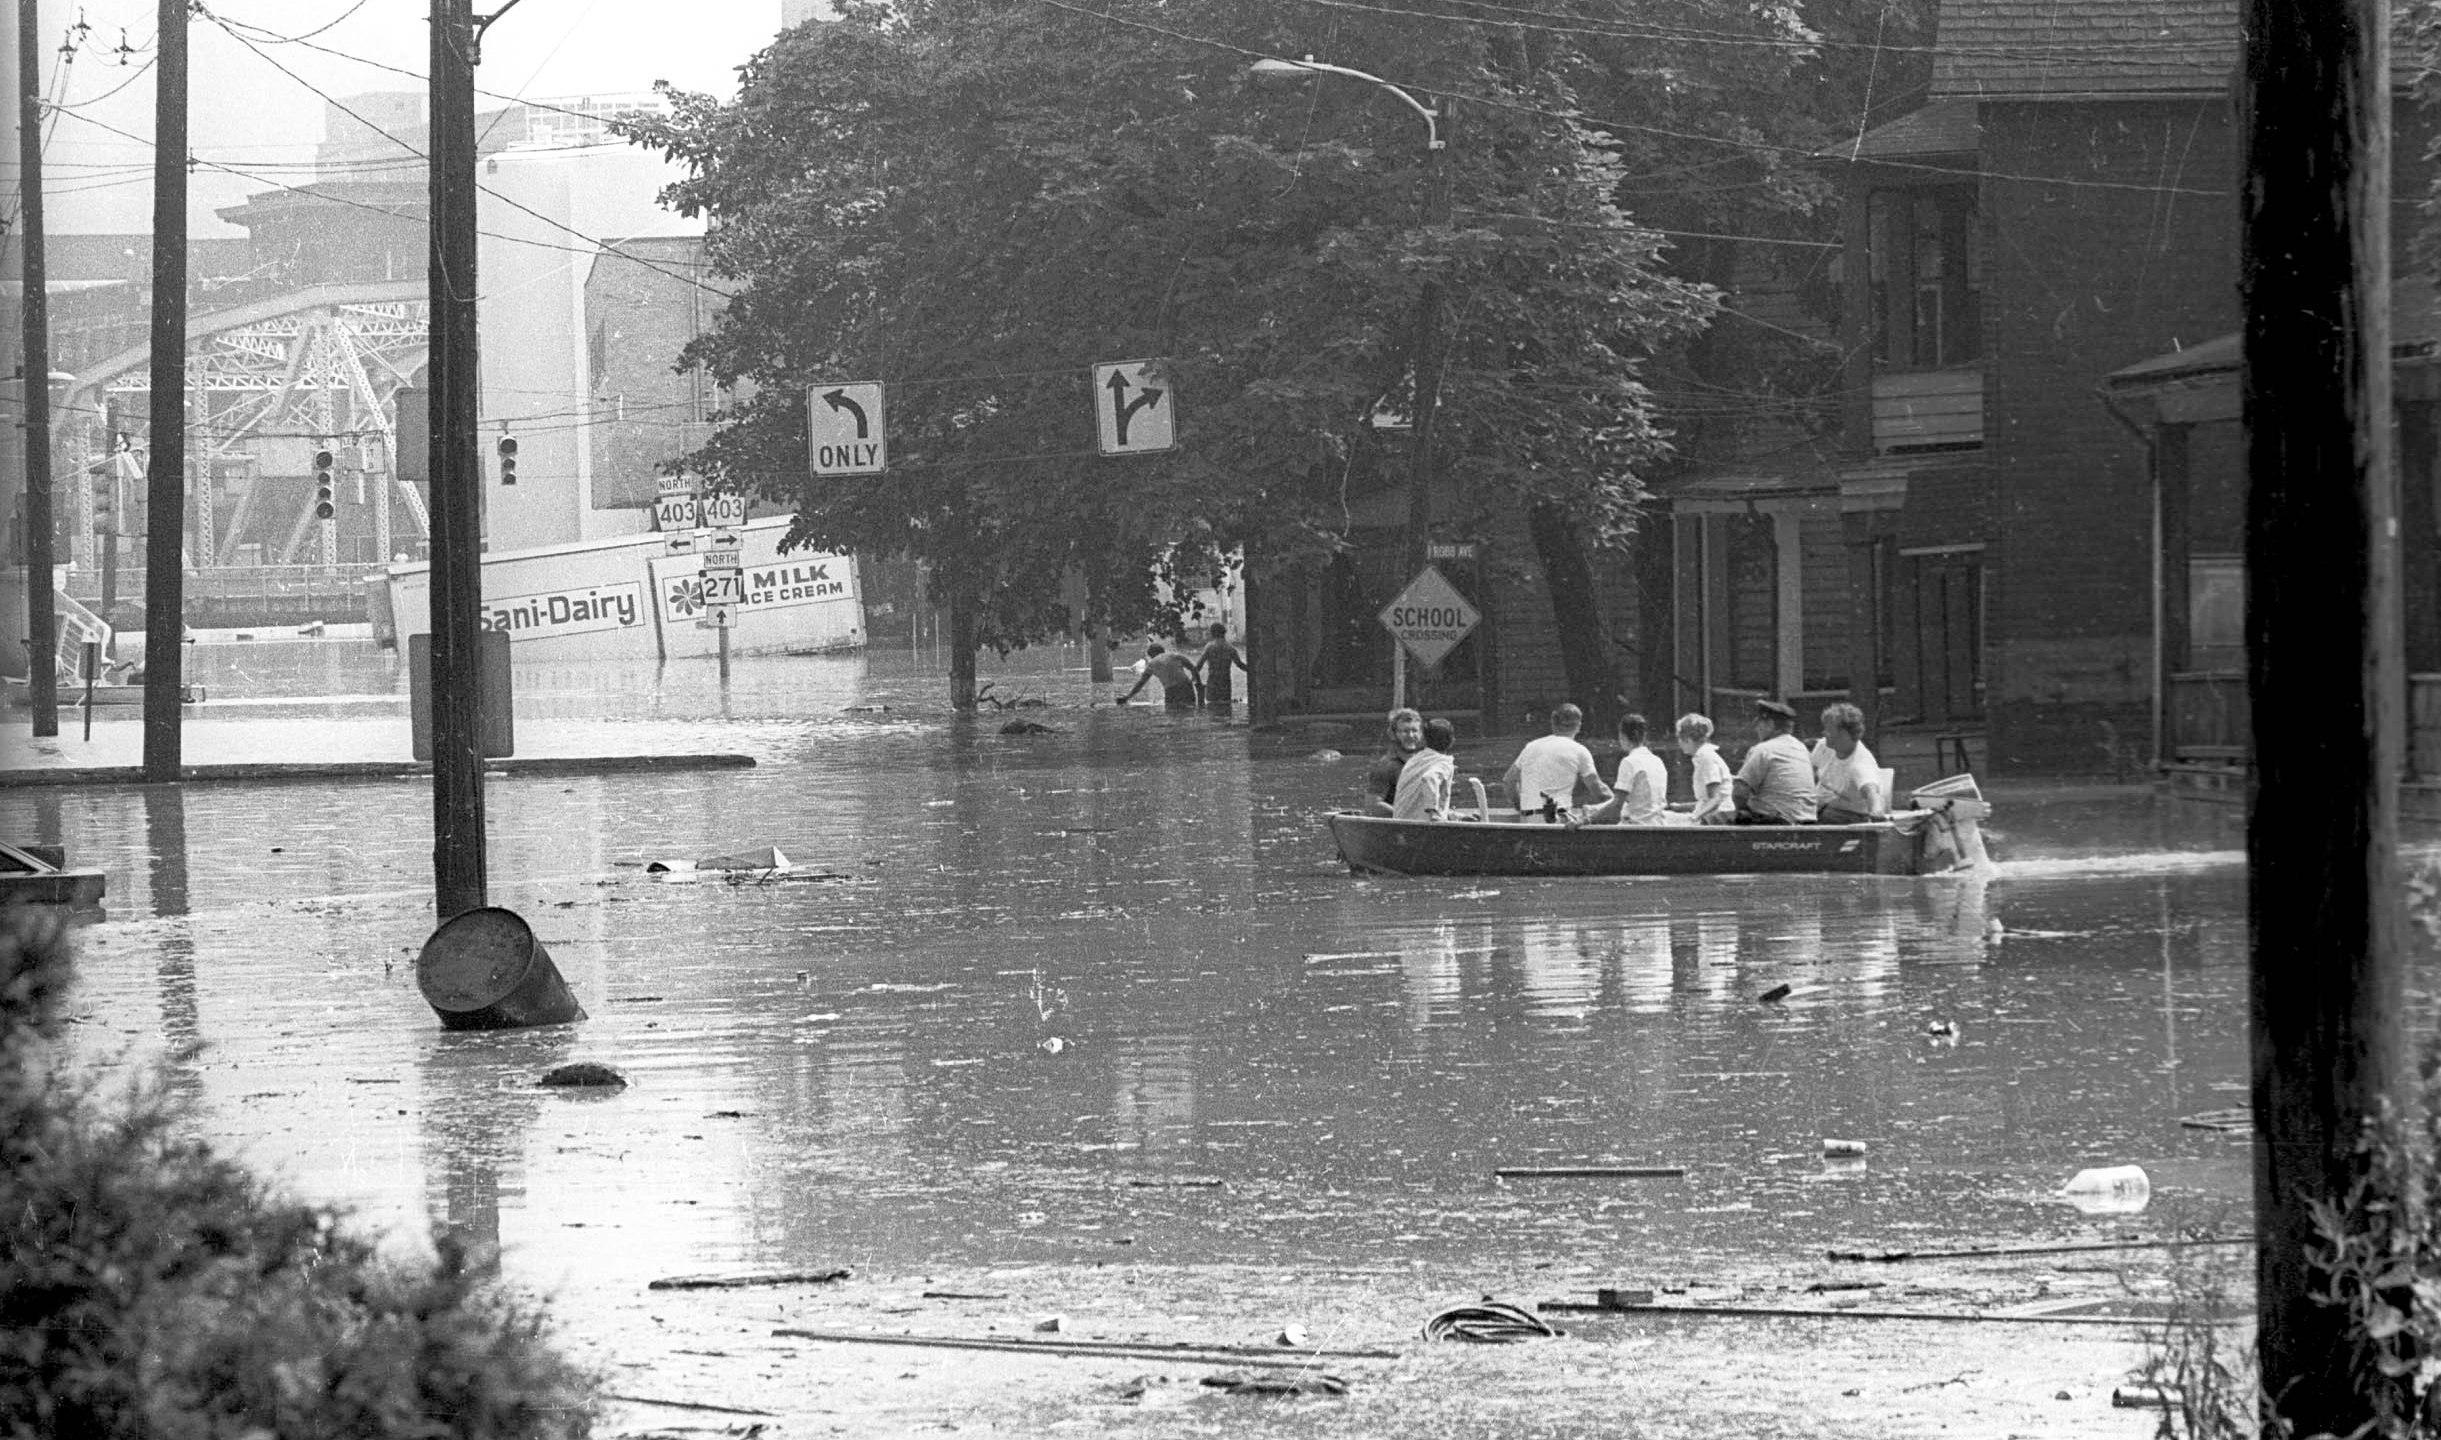 1977 Johnstown Flood